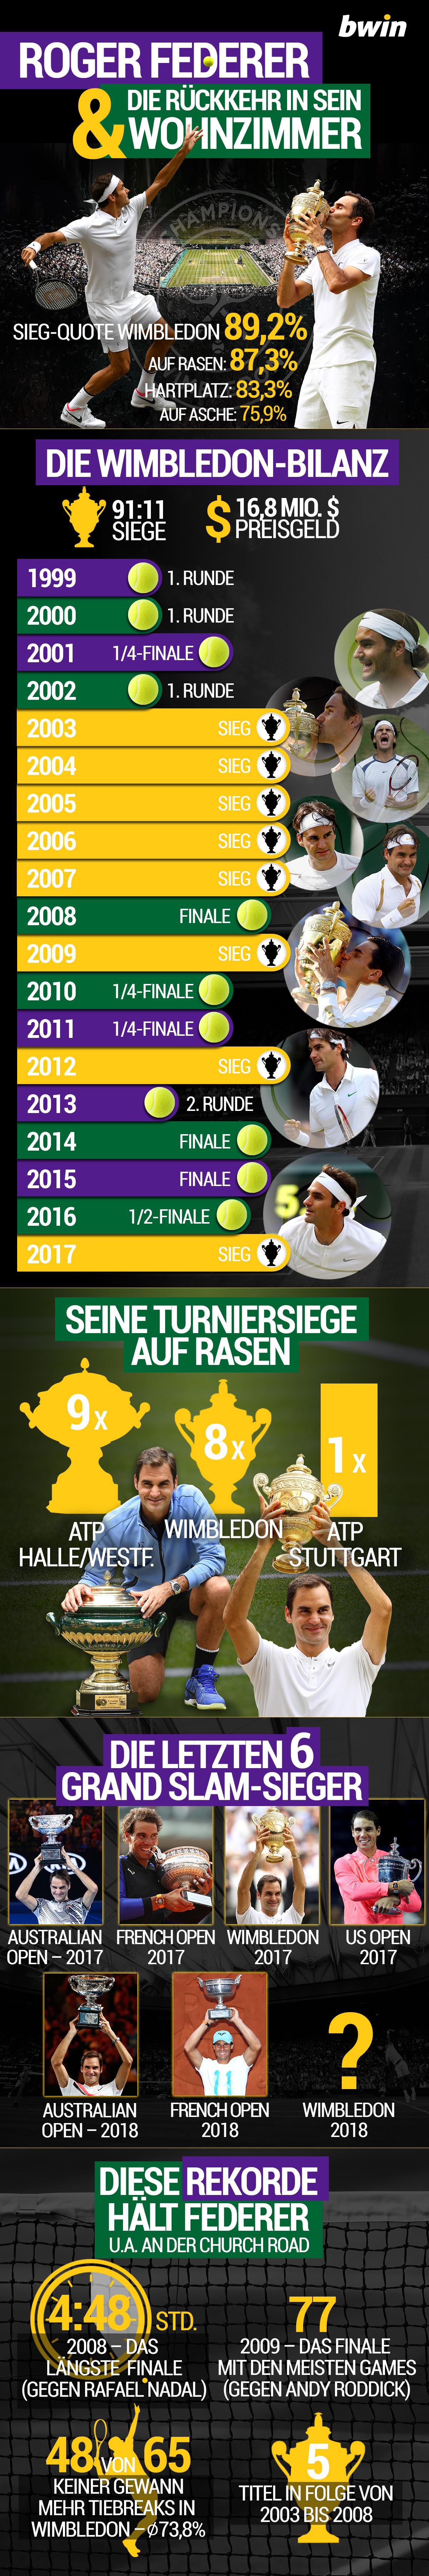 Roger Federer in Wimbledon, Infografik, bwin